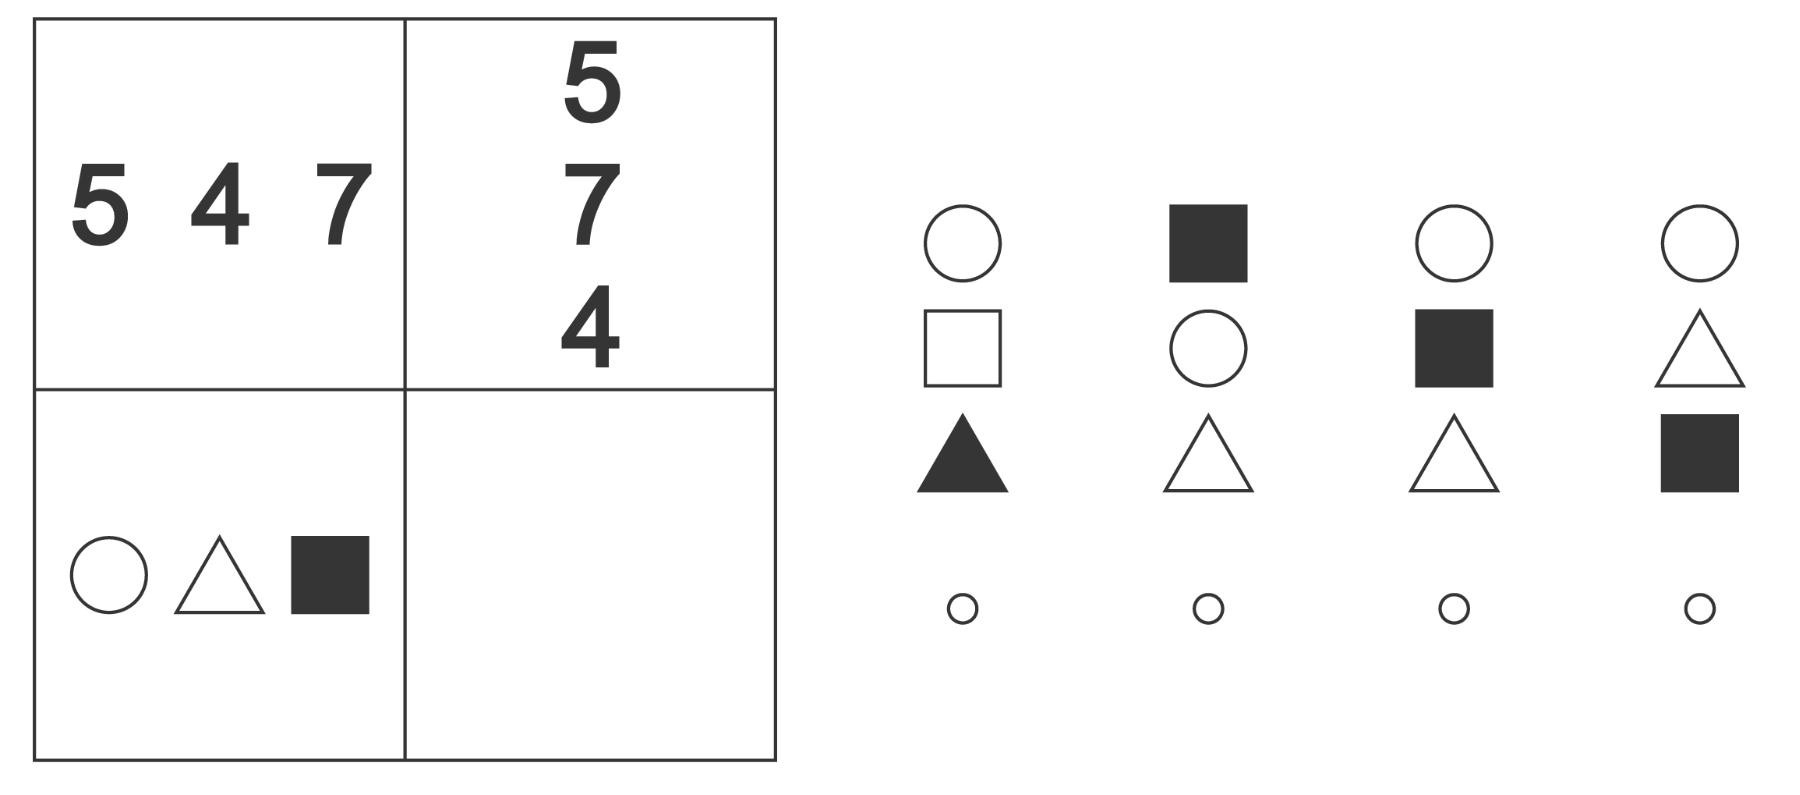 6Th Grade Math Worksheets Printables Free Printable Itbs Practice | Free Printable Itbs Practice Worksheets